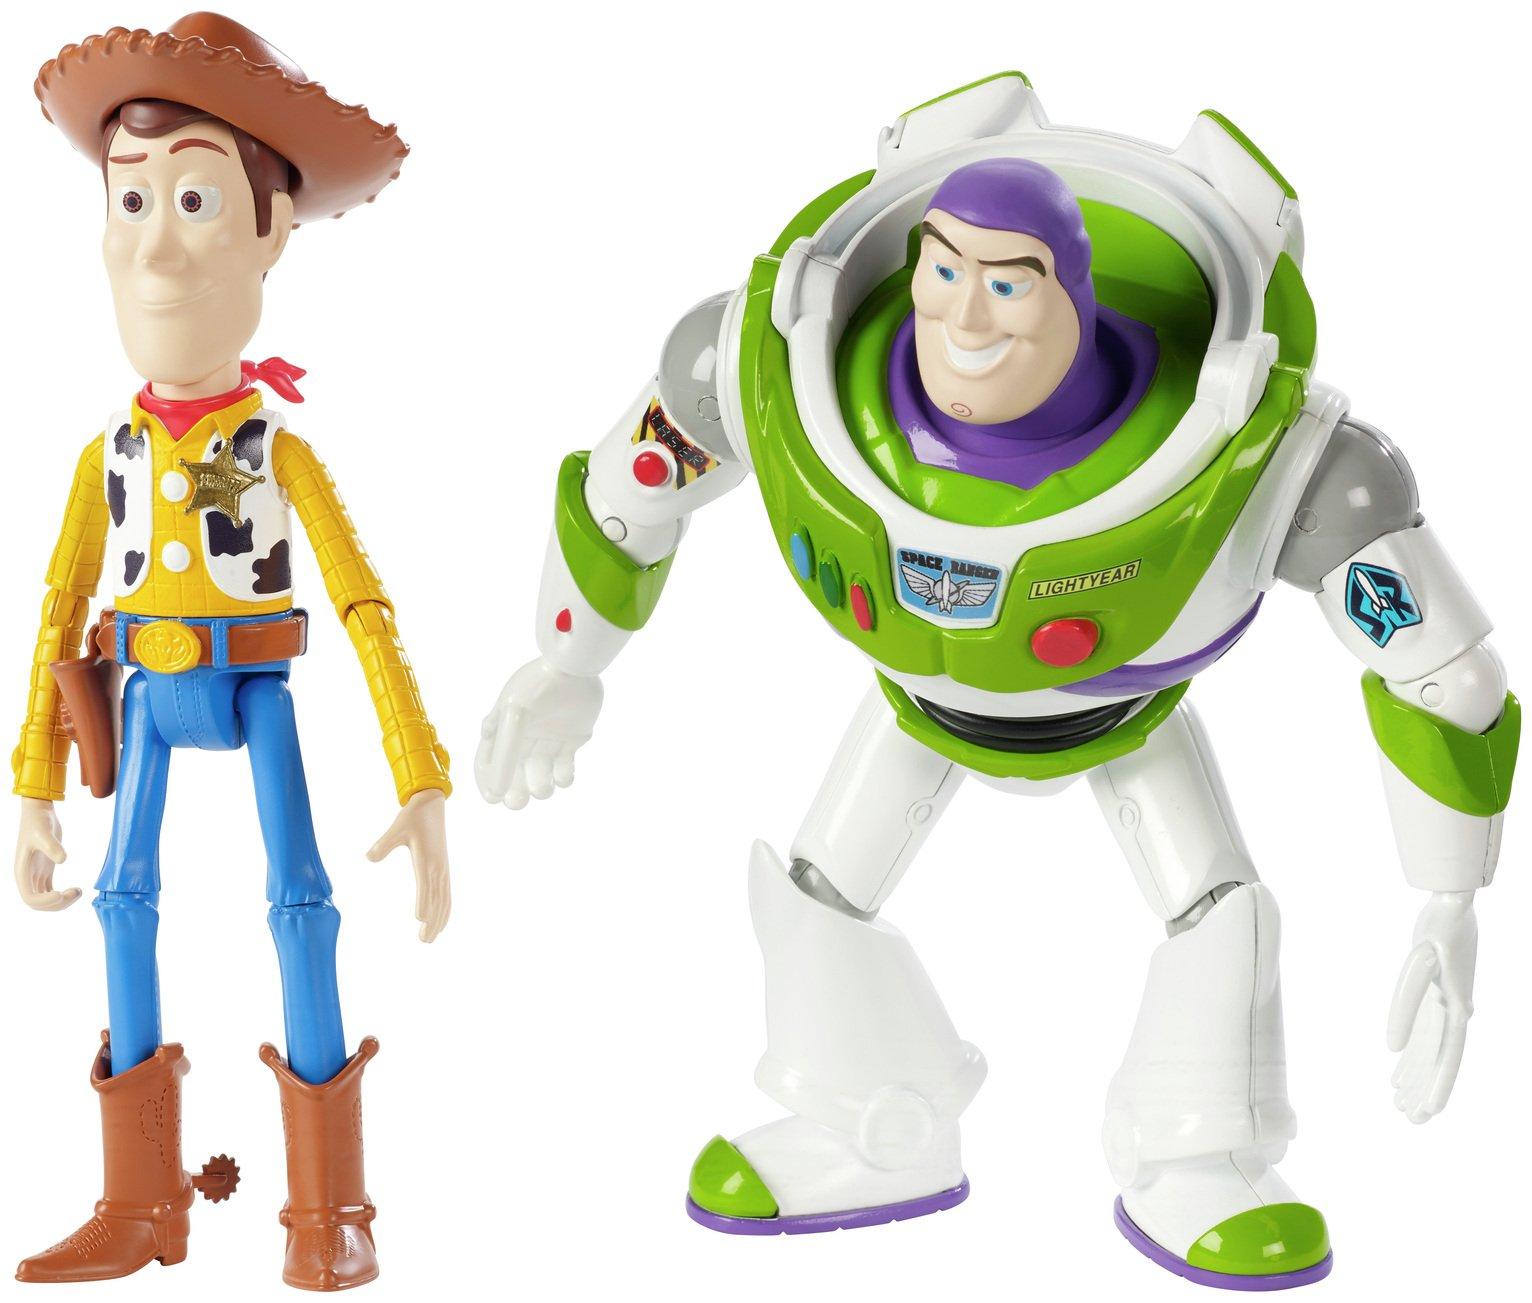 Disney Pixar Toy Story 7inch Woody & Buzz Assortment